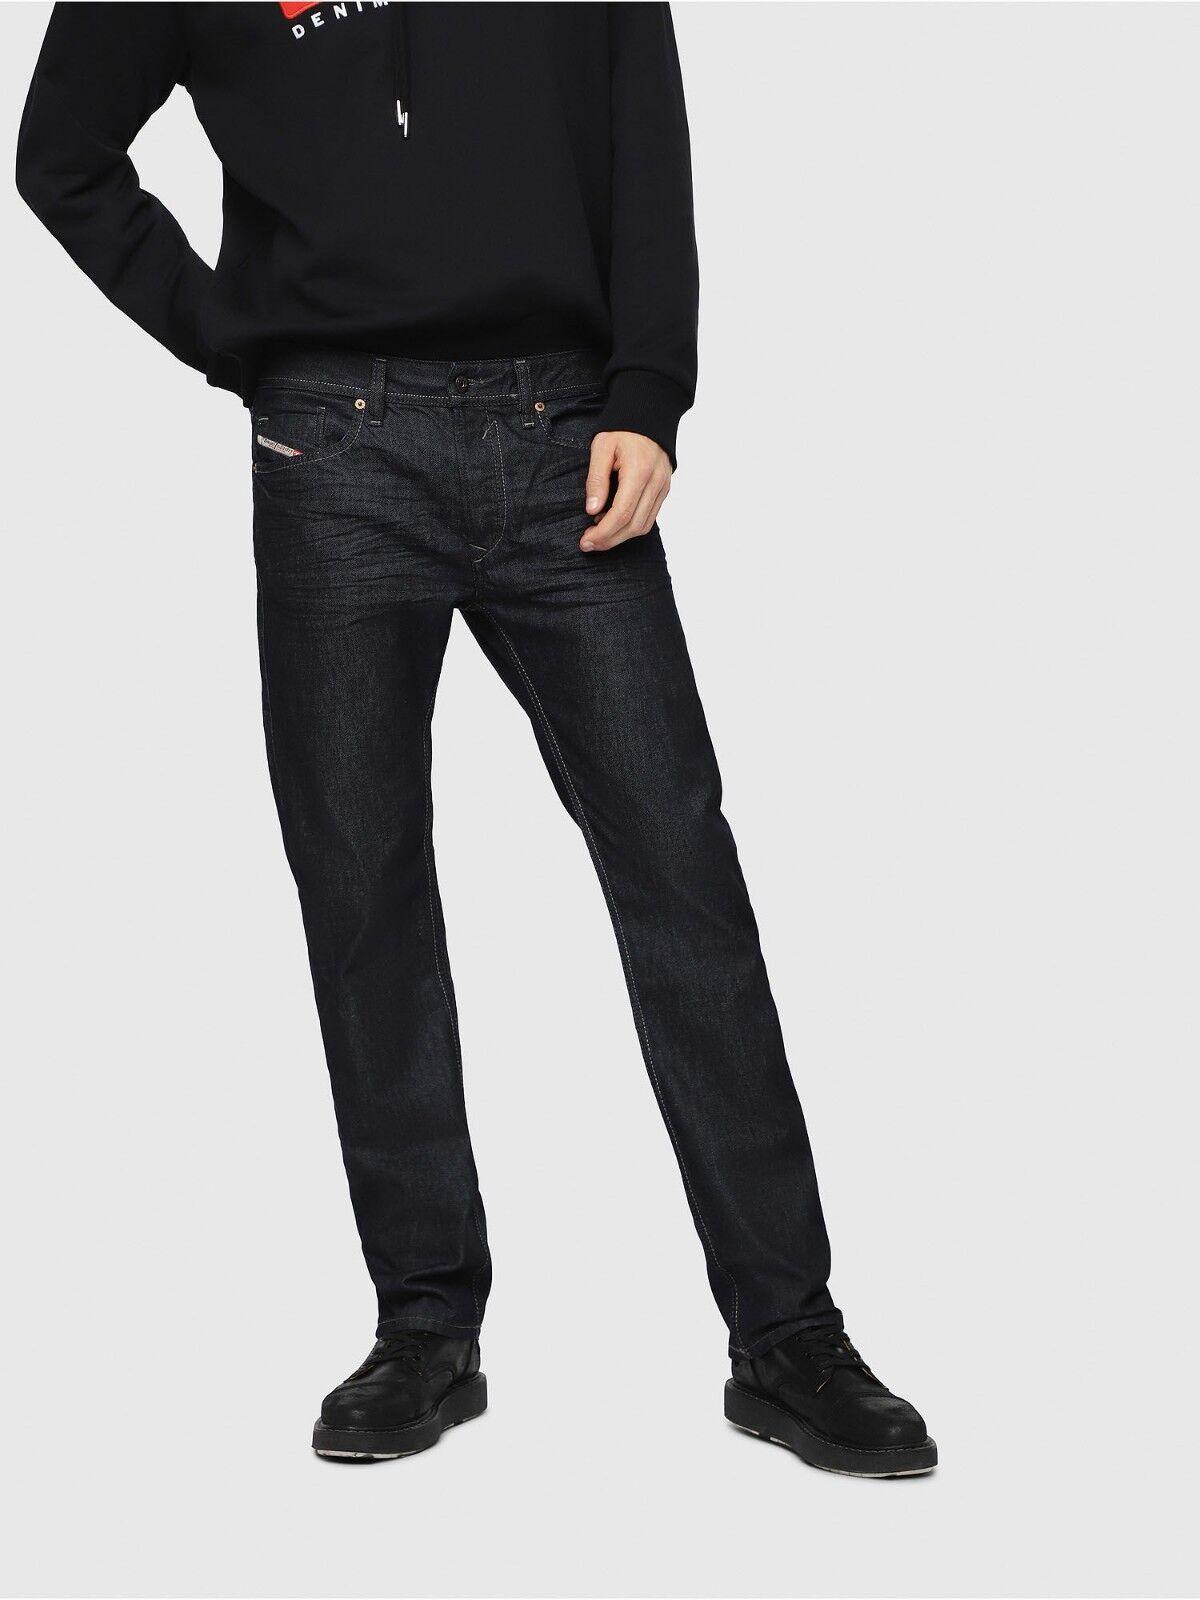 NWT DIESEL Waykee Regular Straight Trousers Denim Size W33 L30 00S11A00Z88